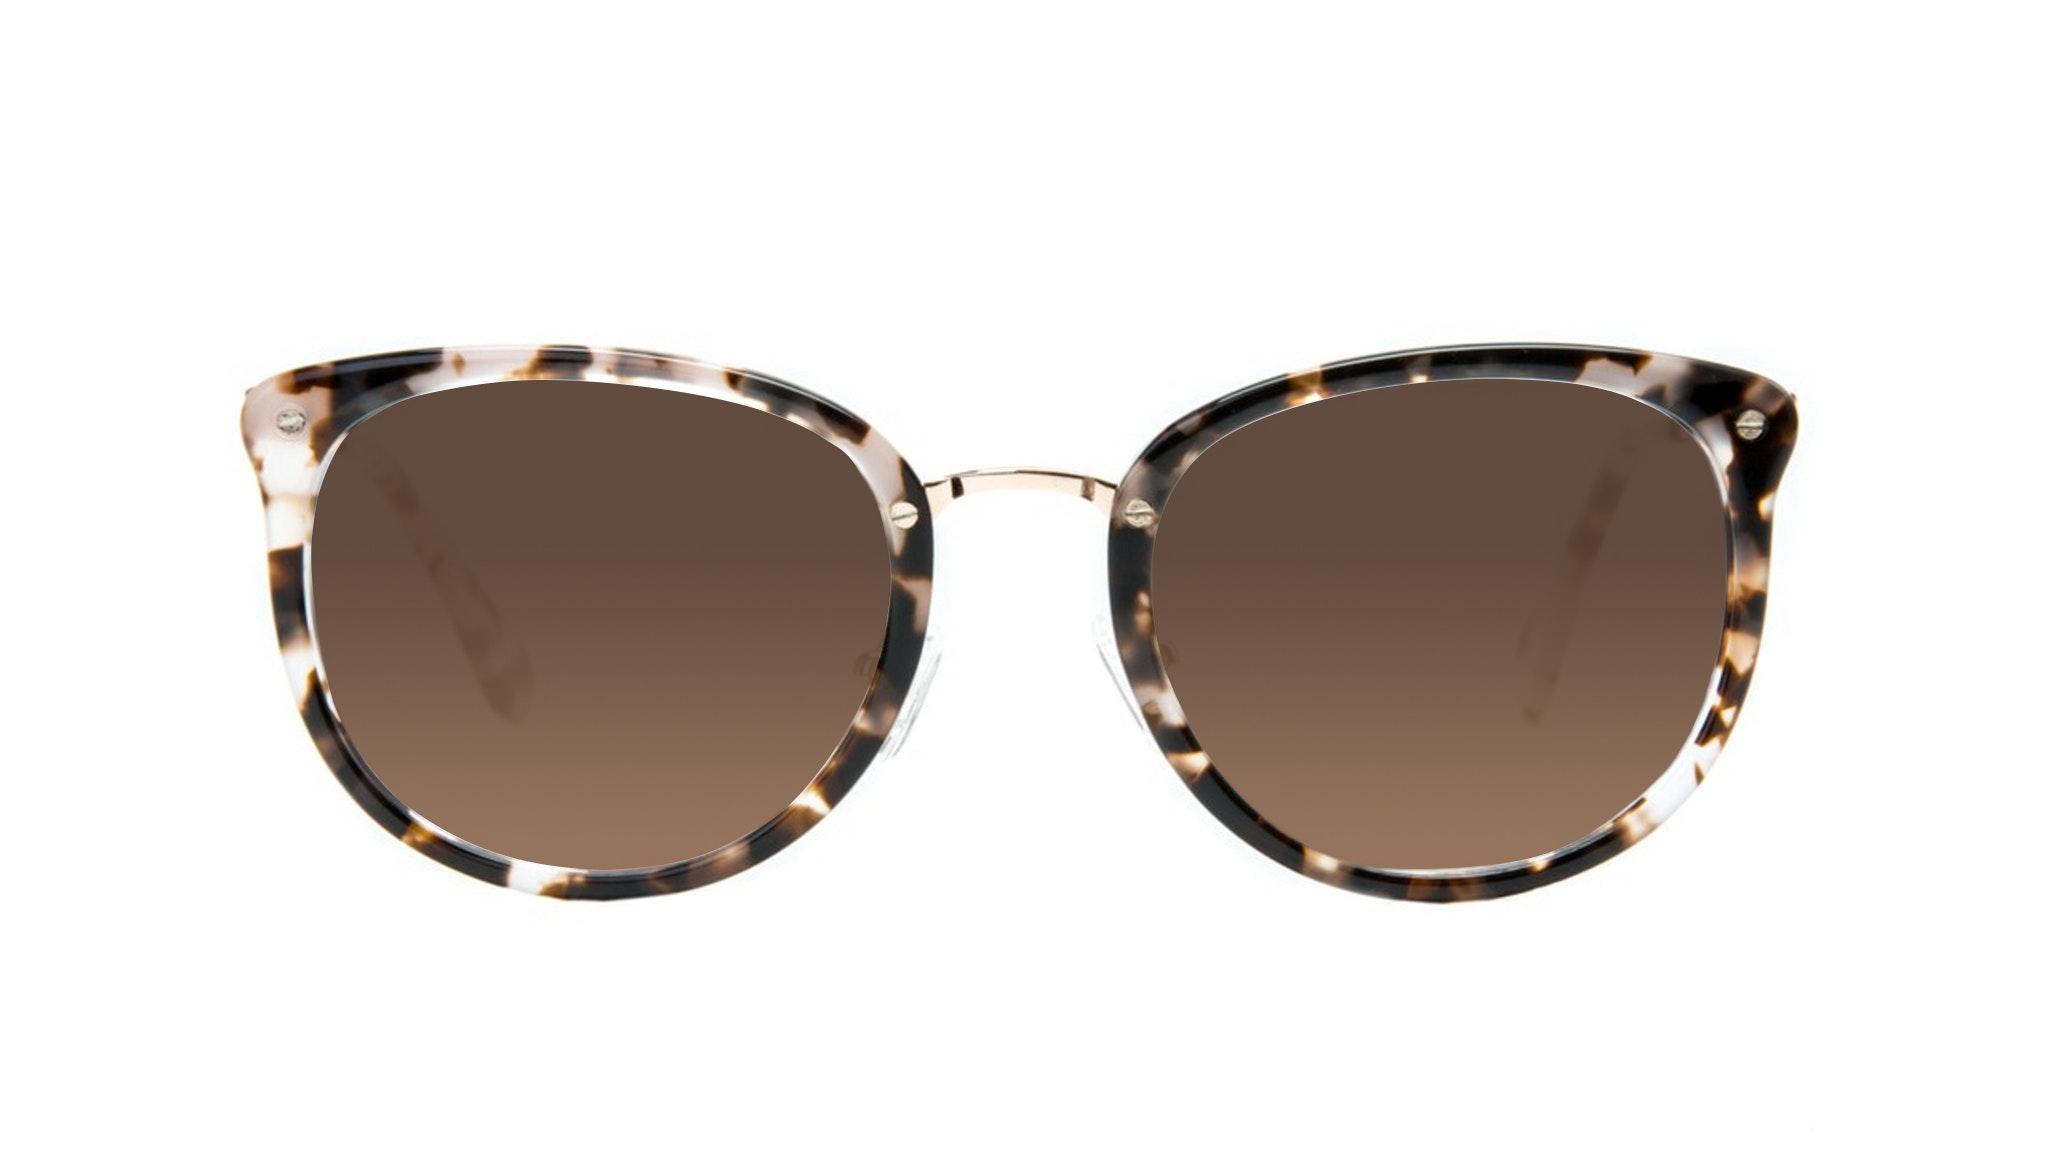 Affordable Fashion Glasses Square Round Sunglasses Women Amaze Mocha Tortoise Front